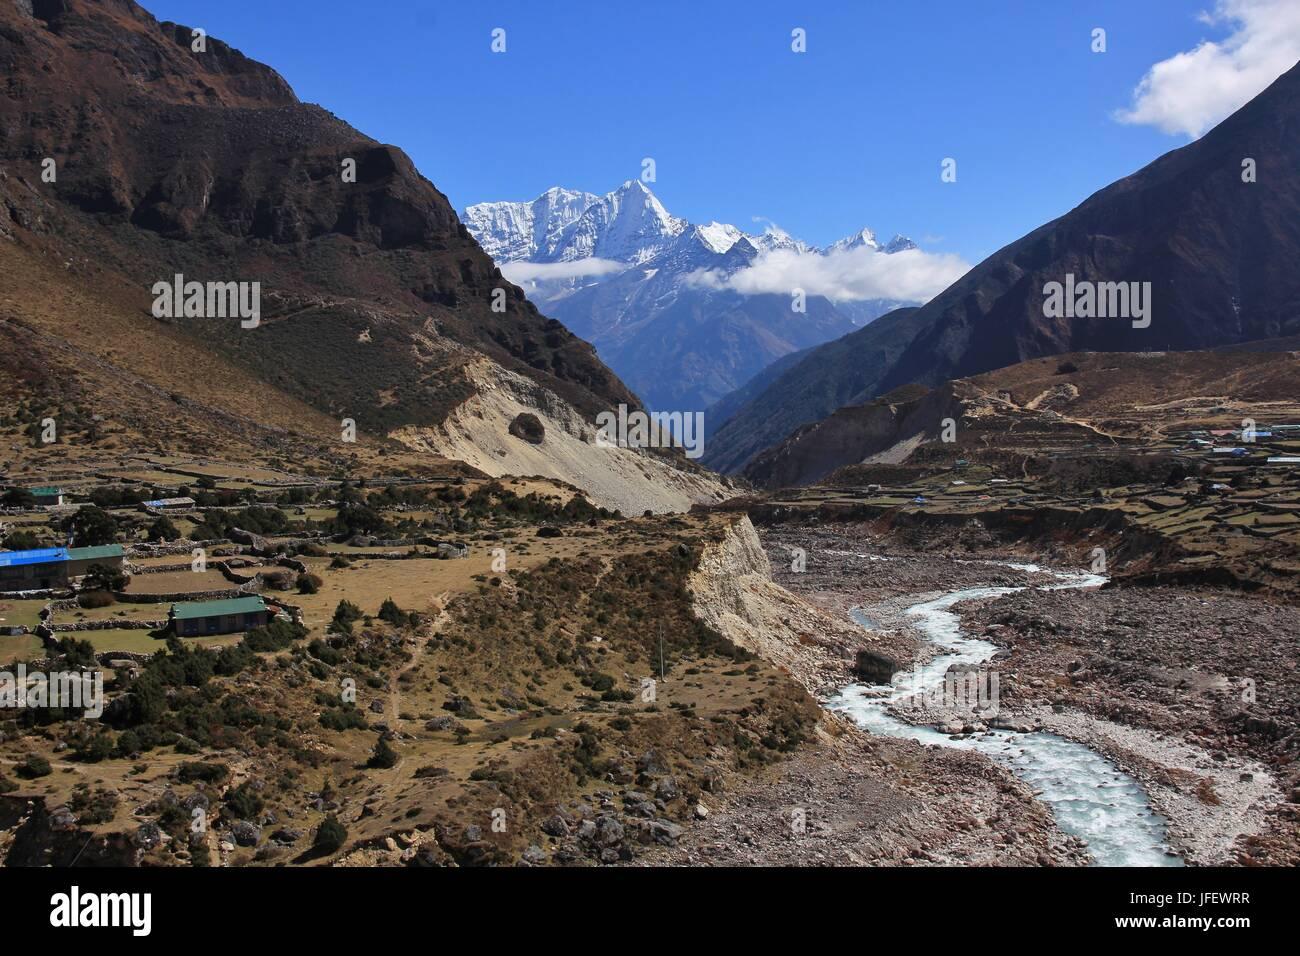 Thame valley, Everest National Park, Nepal - Stock Image